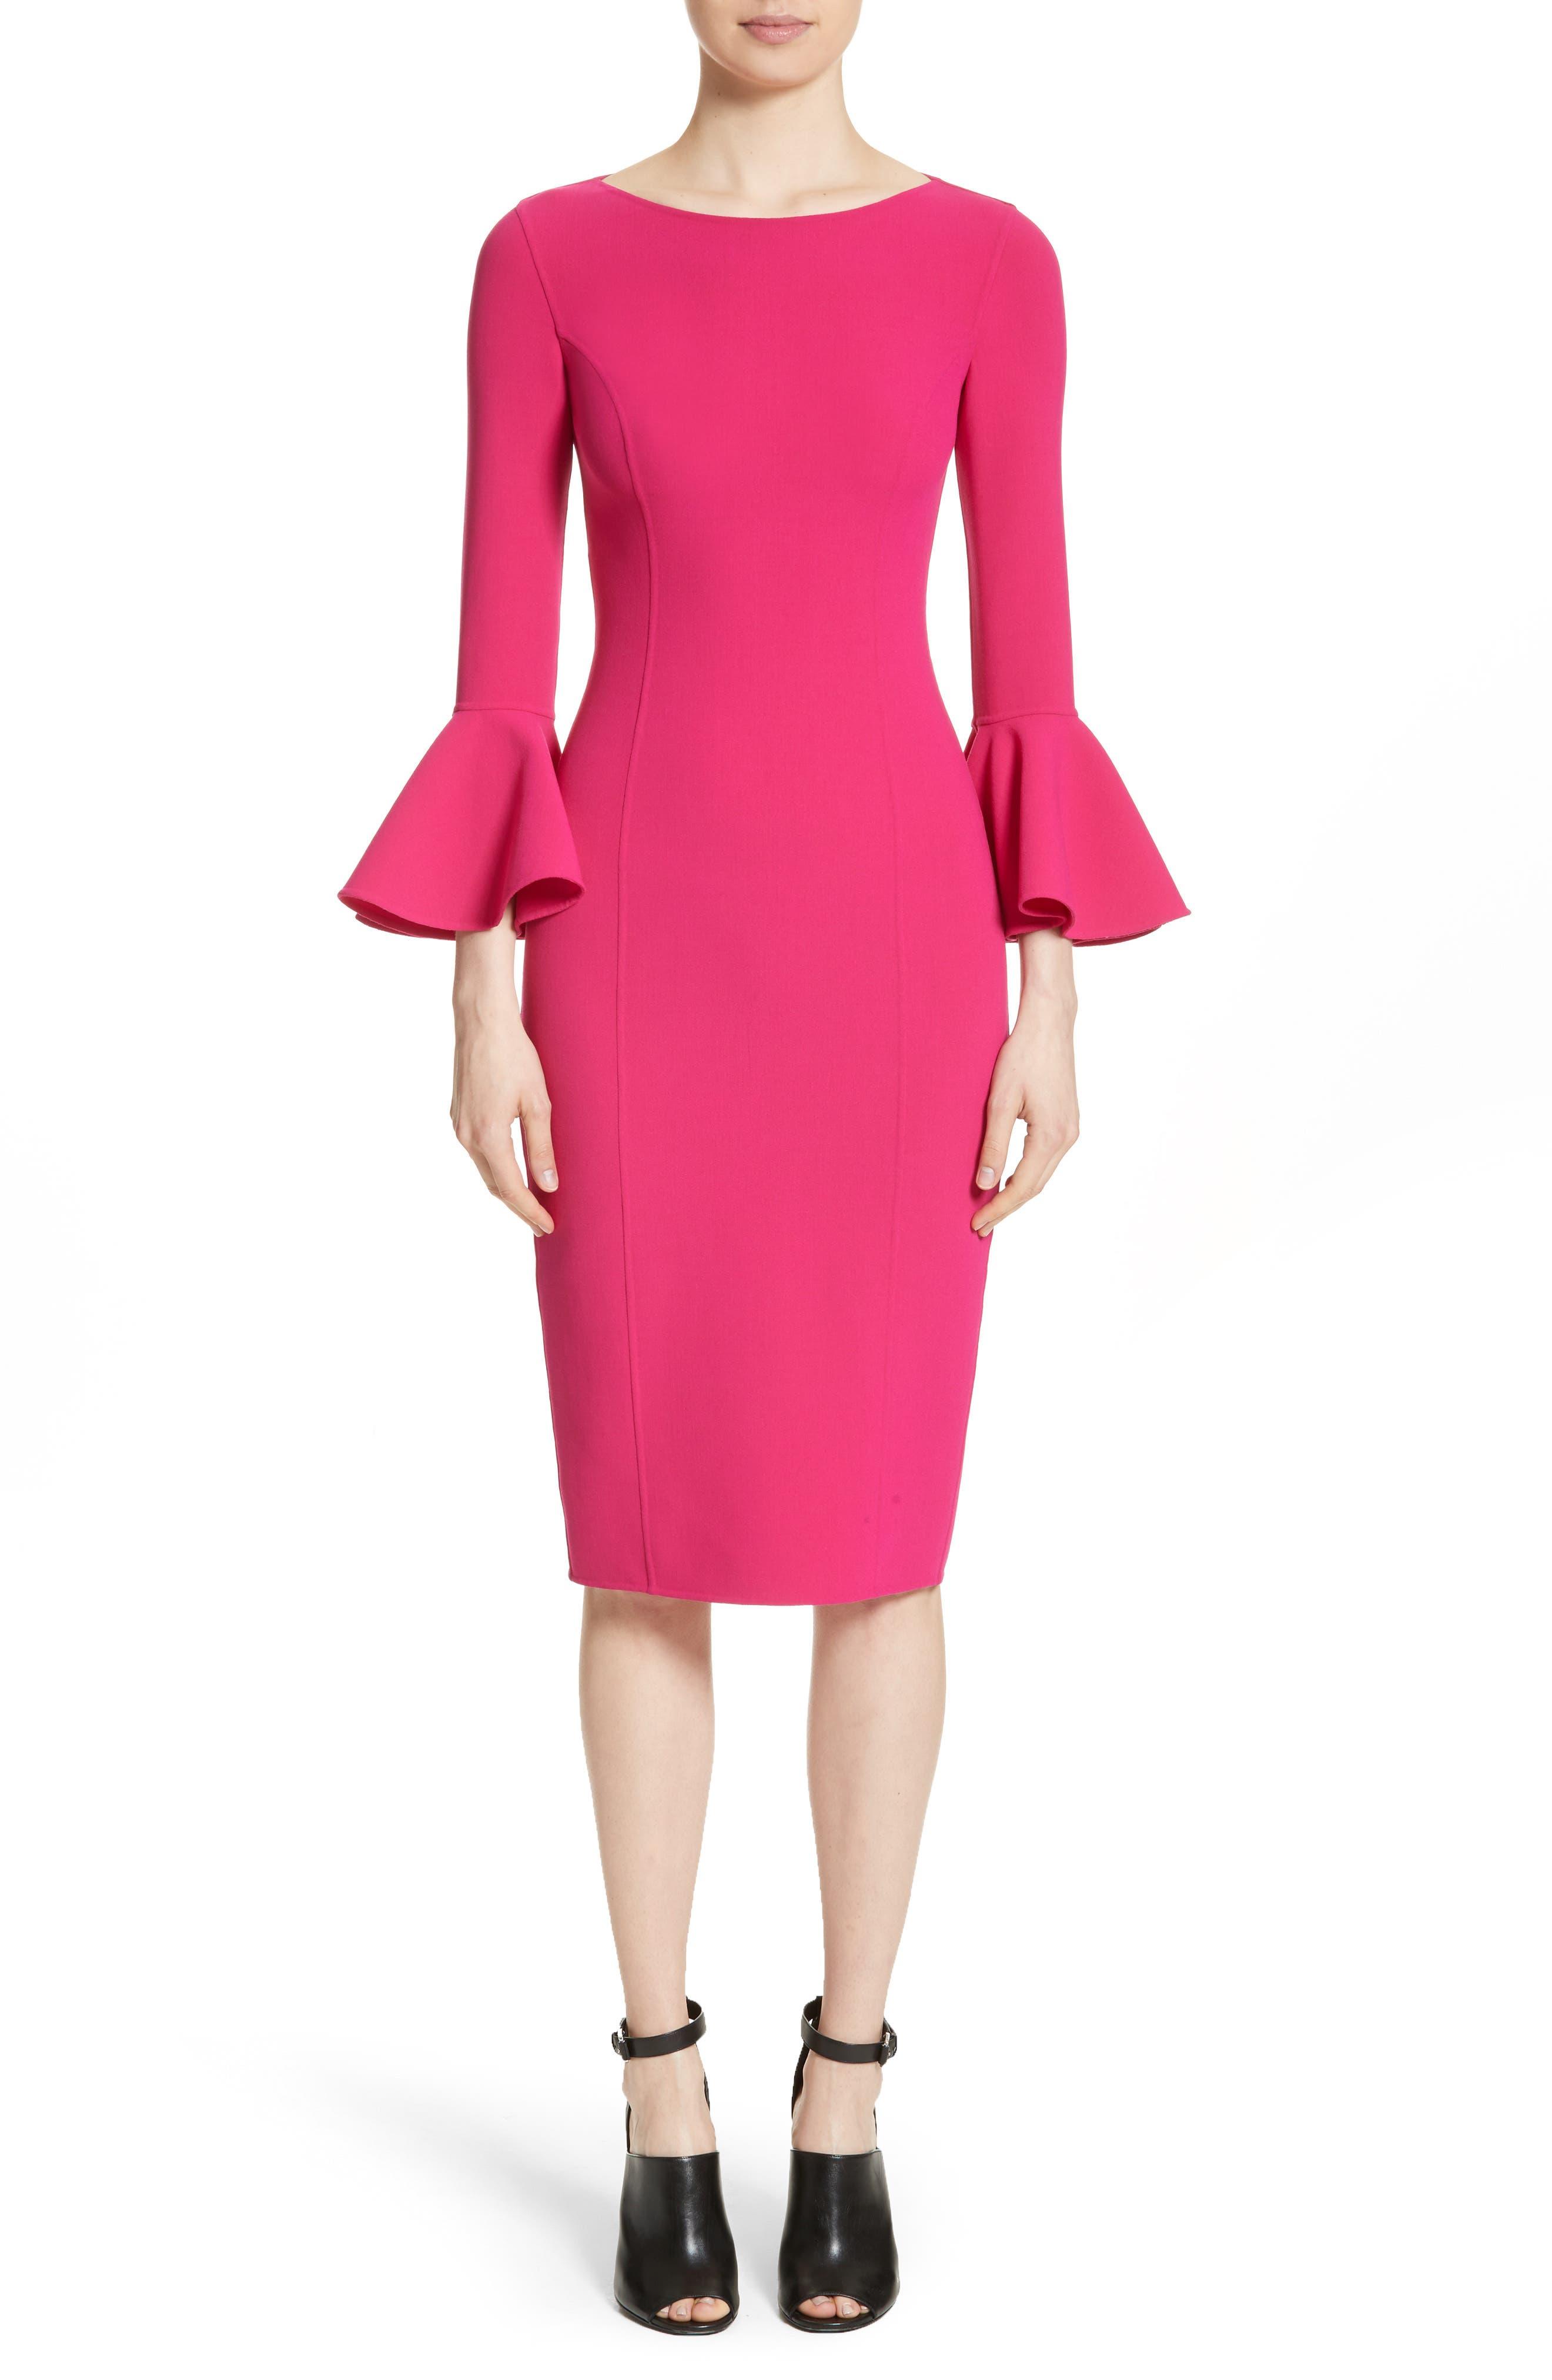 Main Image - Michael Kors Bell Cuff Sheath Dress